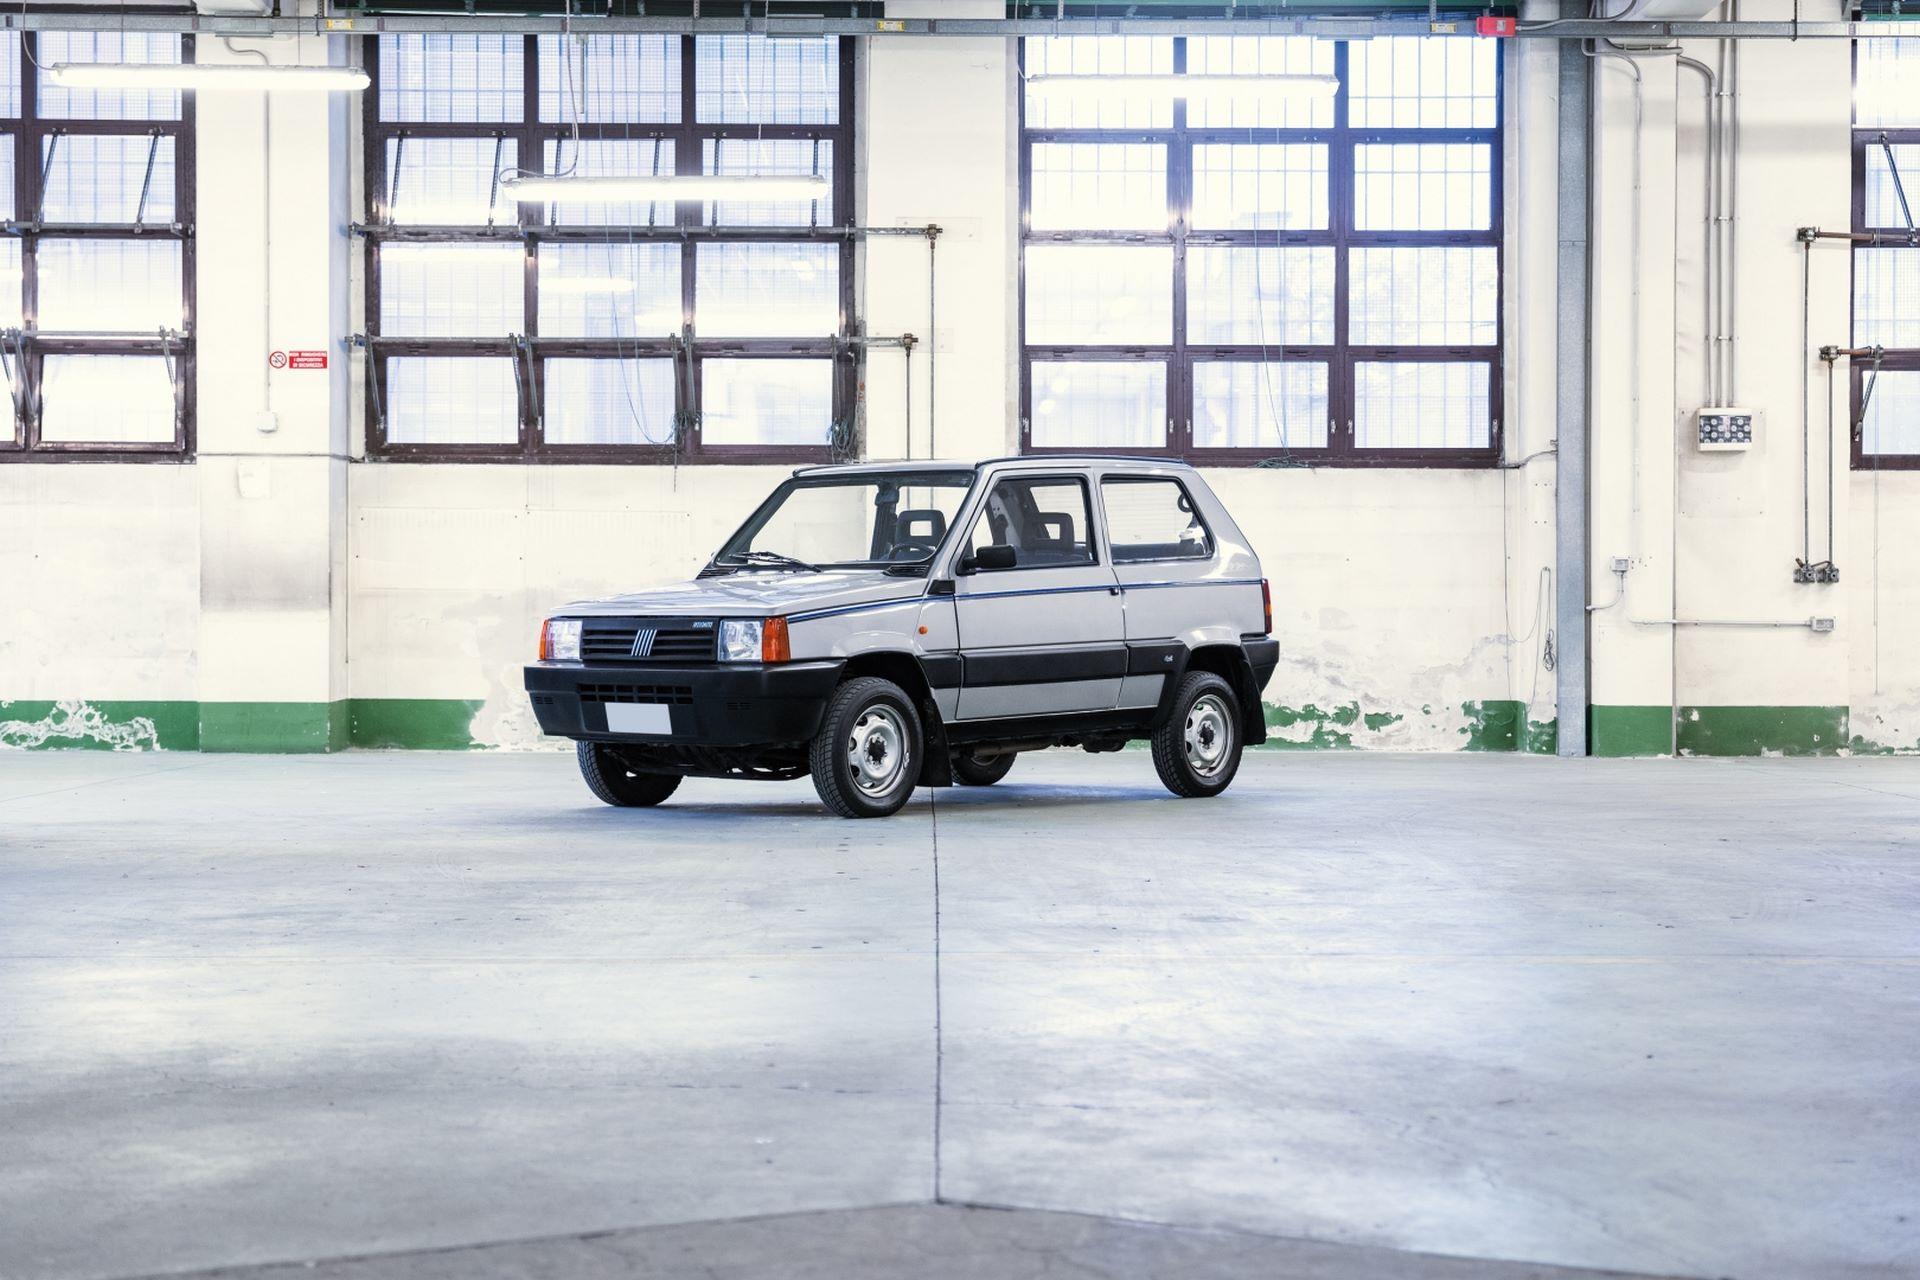 Fiat-Panda-Gianni-Agnelli-auction-1